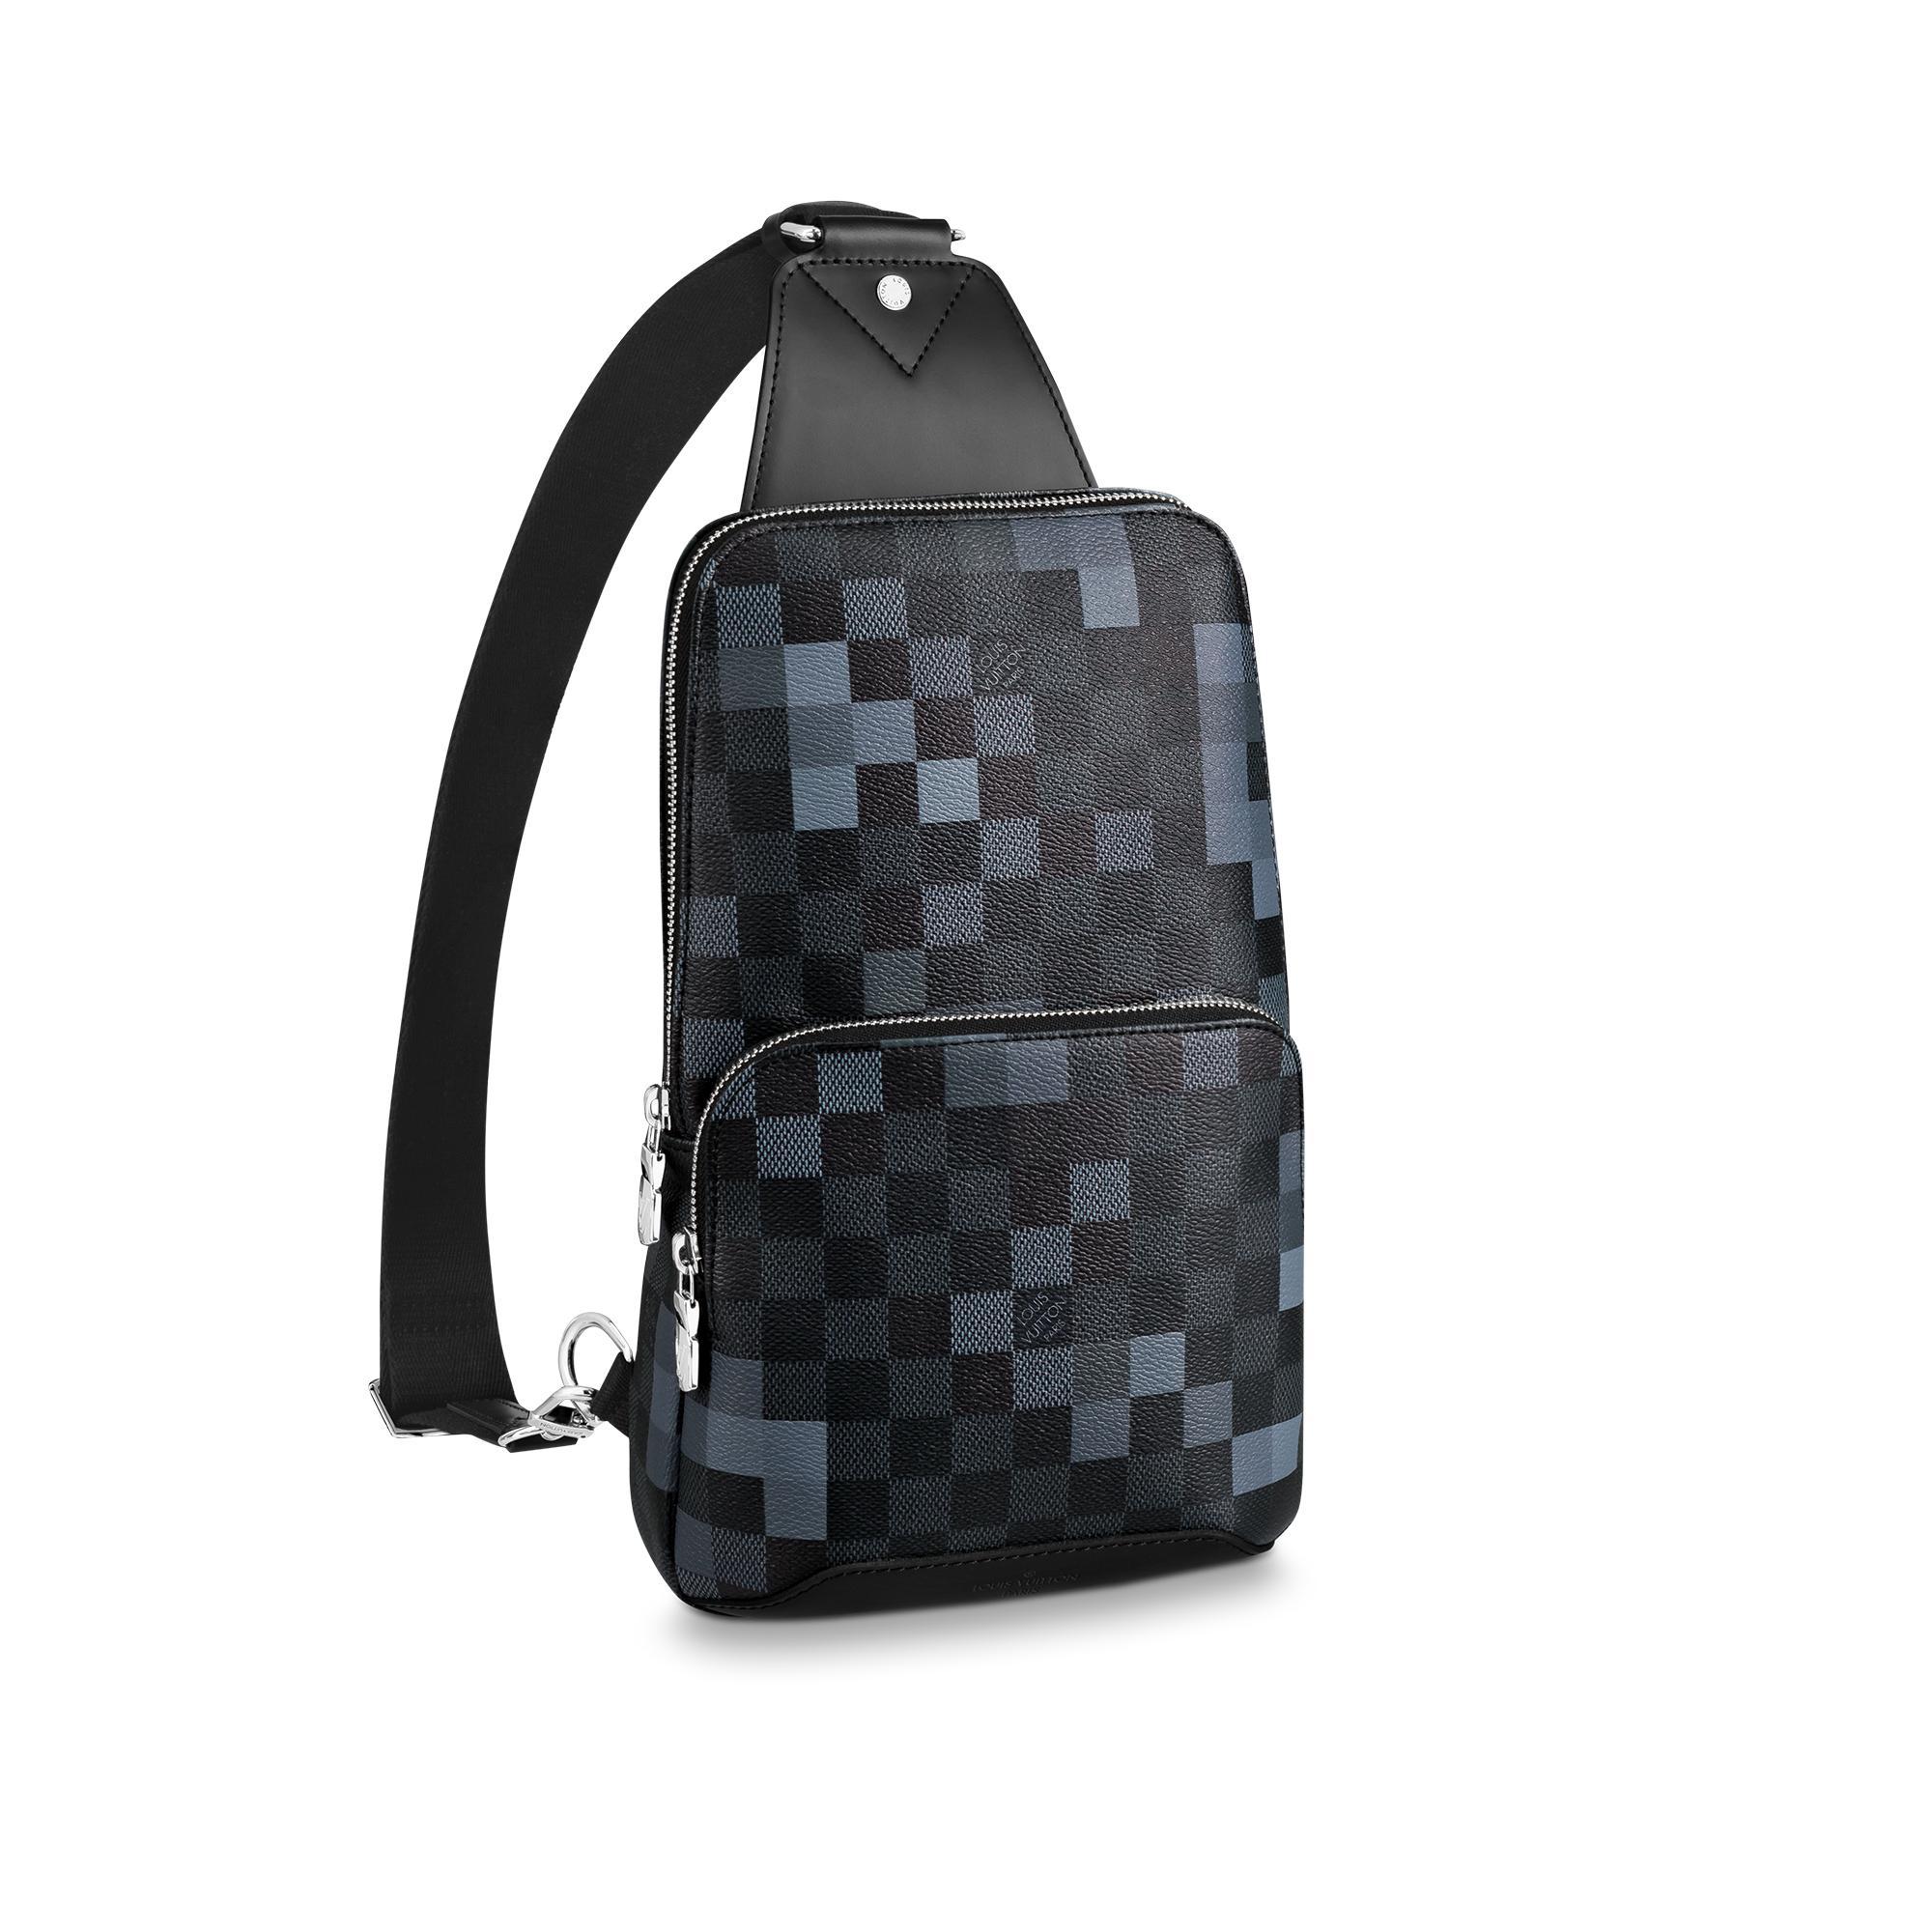 6b5ecb7d5a57 Louis Vuitton Avenue Sling Bag In Damier Graphite Canvas